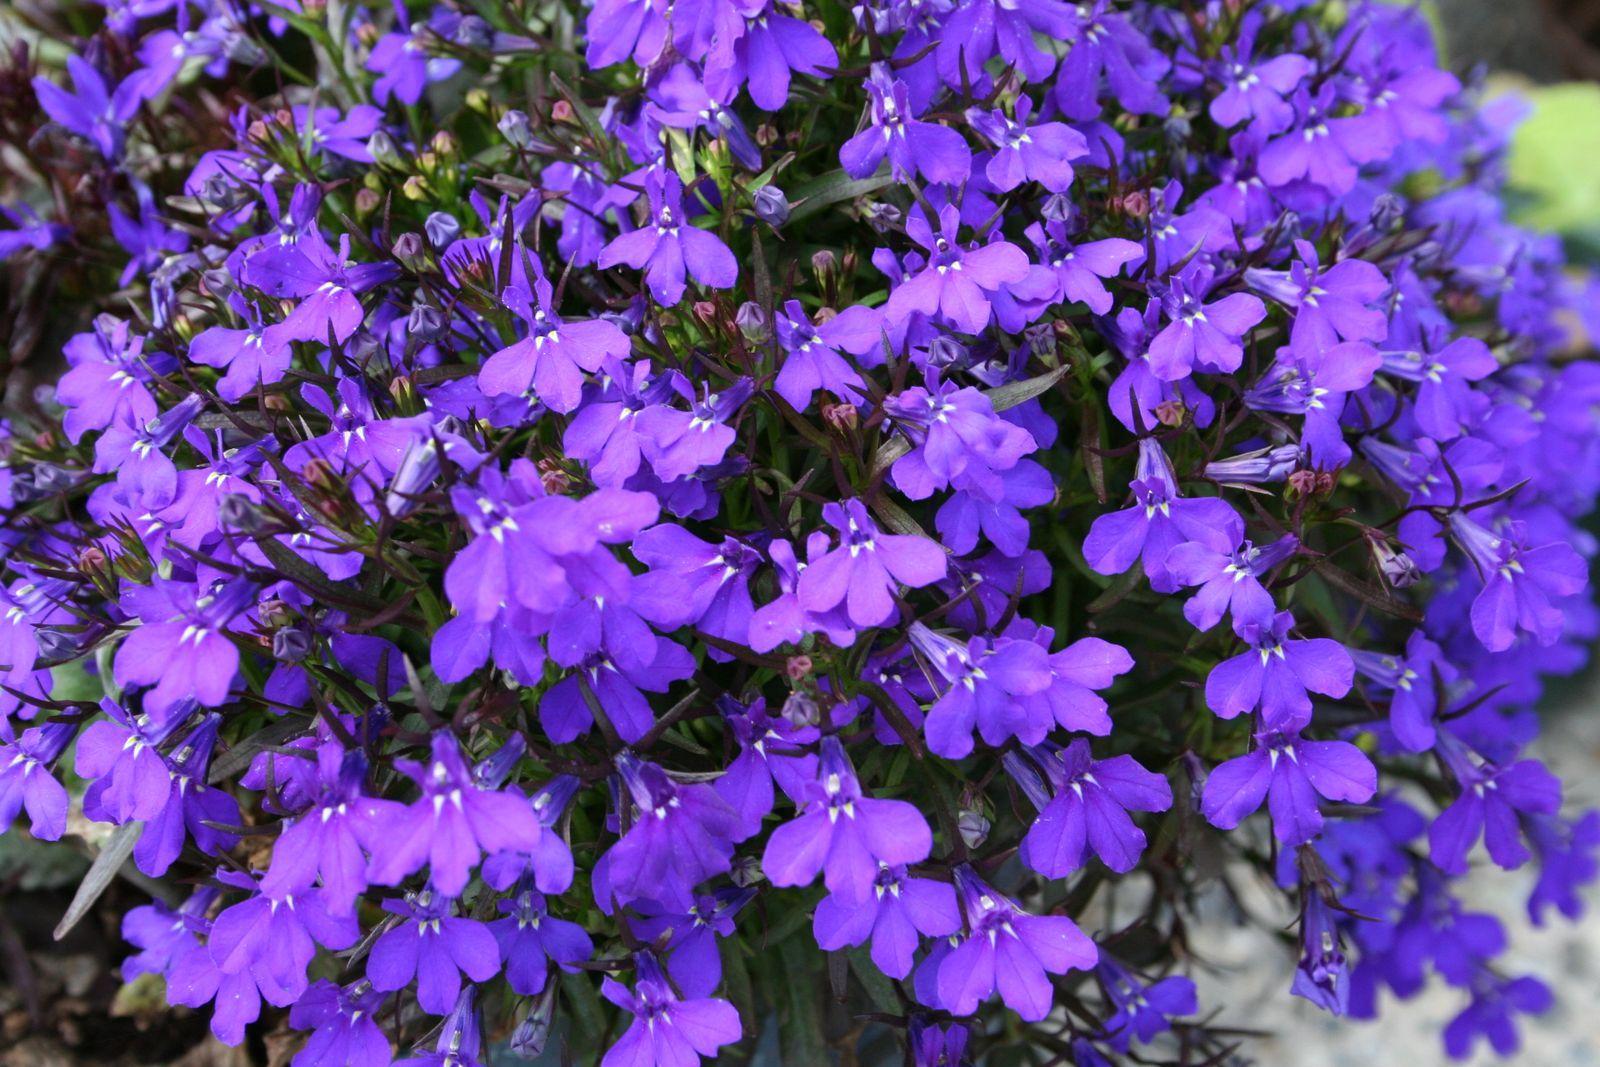 Beste lobelia - schaduwplant! | Schaduwplanten, Schaduwtuin, Schaduw planten PM-74